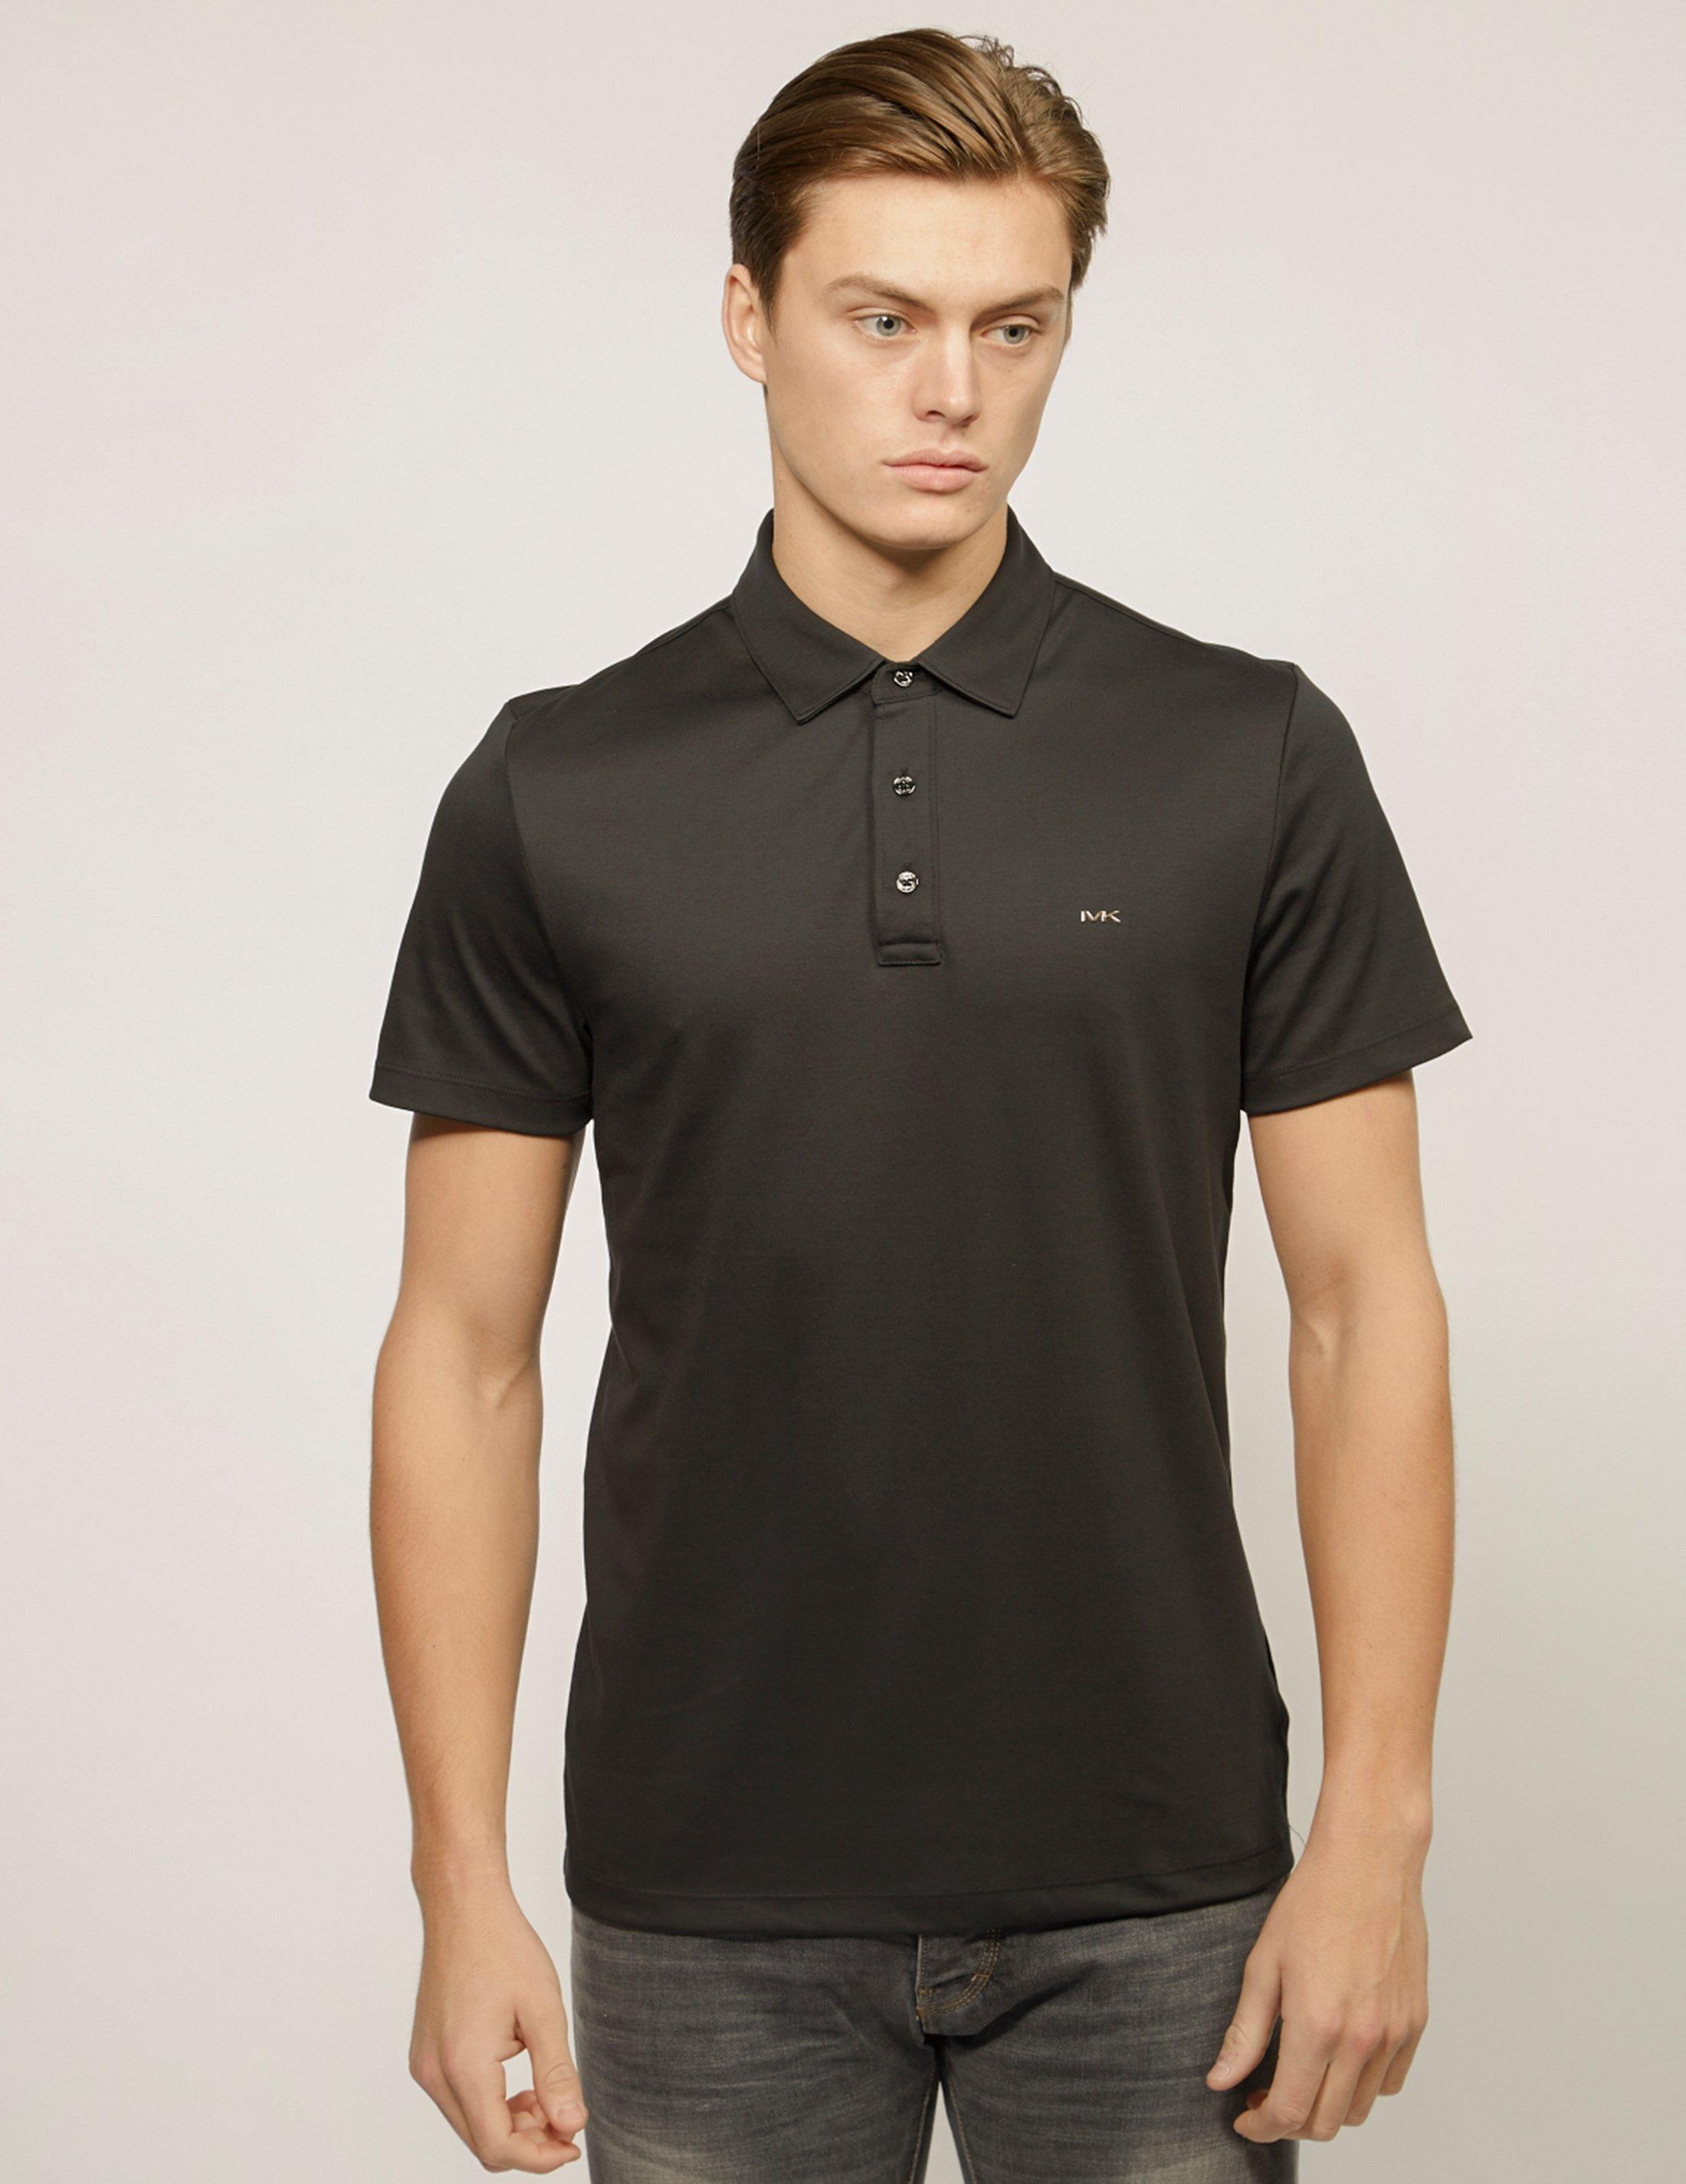 ccc1b919 Lyst - Michael Kors Mens Sleek Short Sleeve Polo Shirt Black in ...